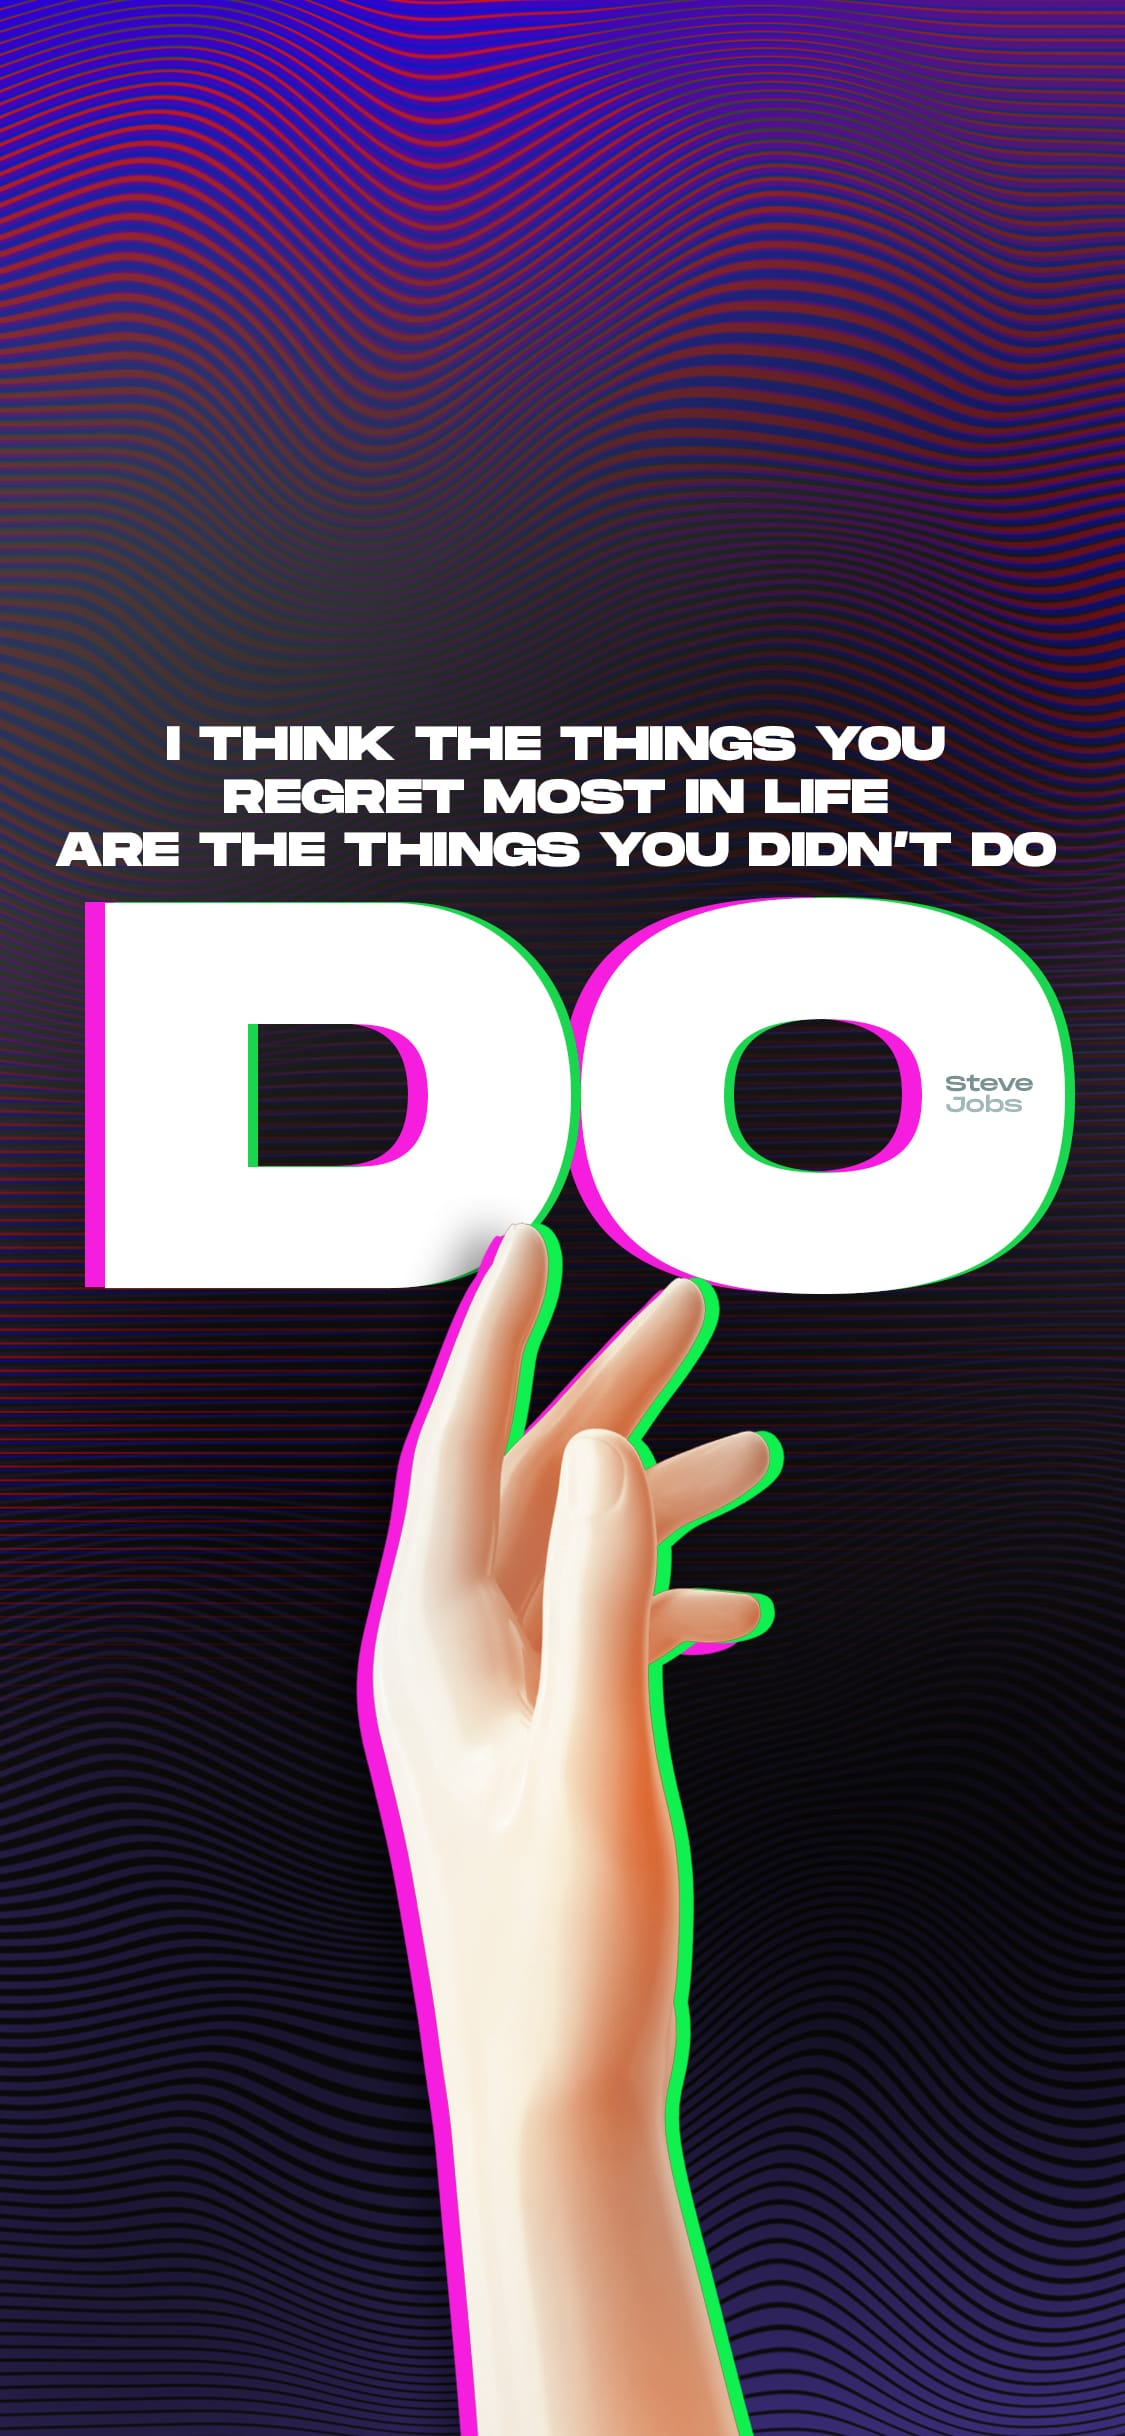 Steve Jobs Inspiring quote 4